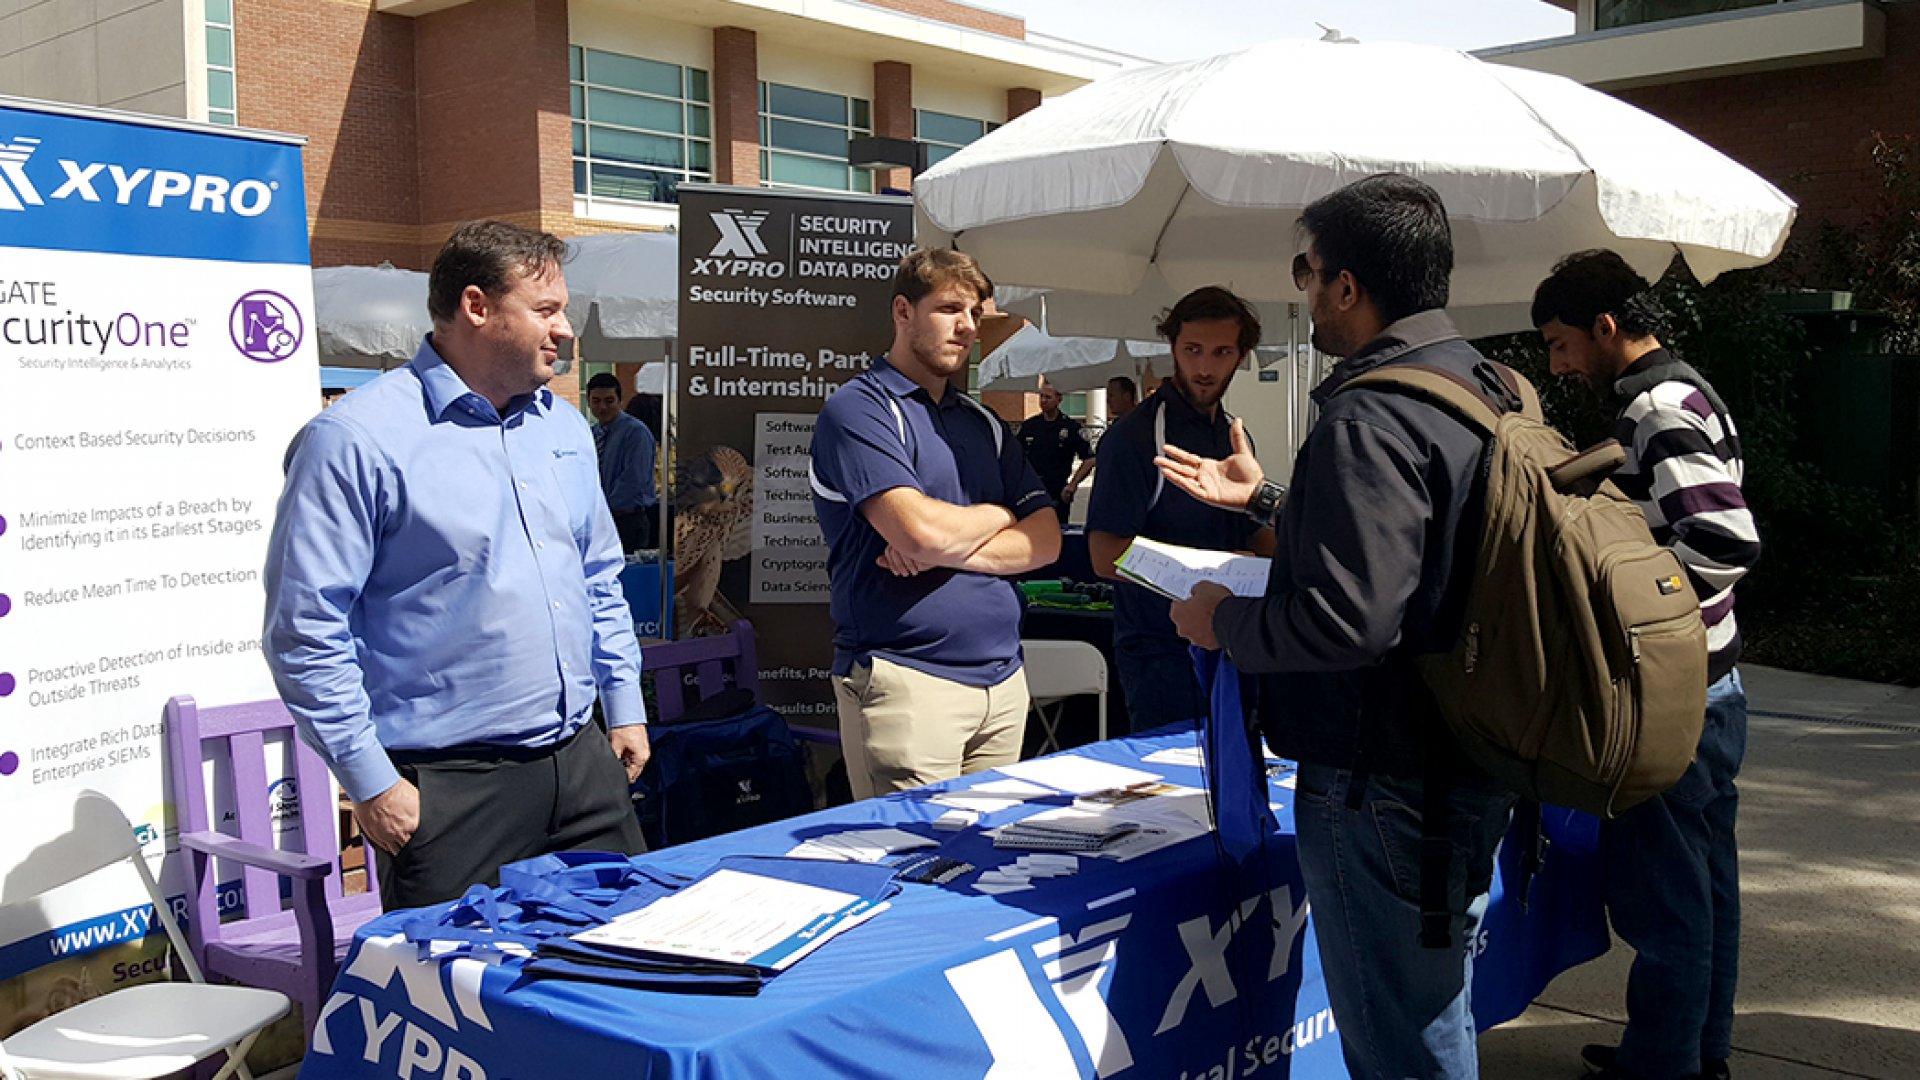 Xypro at the CLU Job Fair 2017.